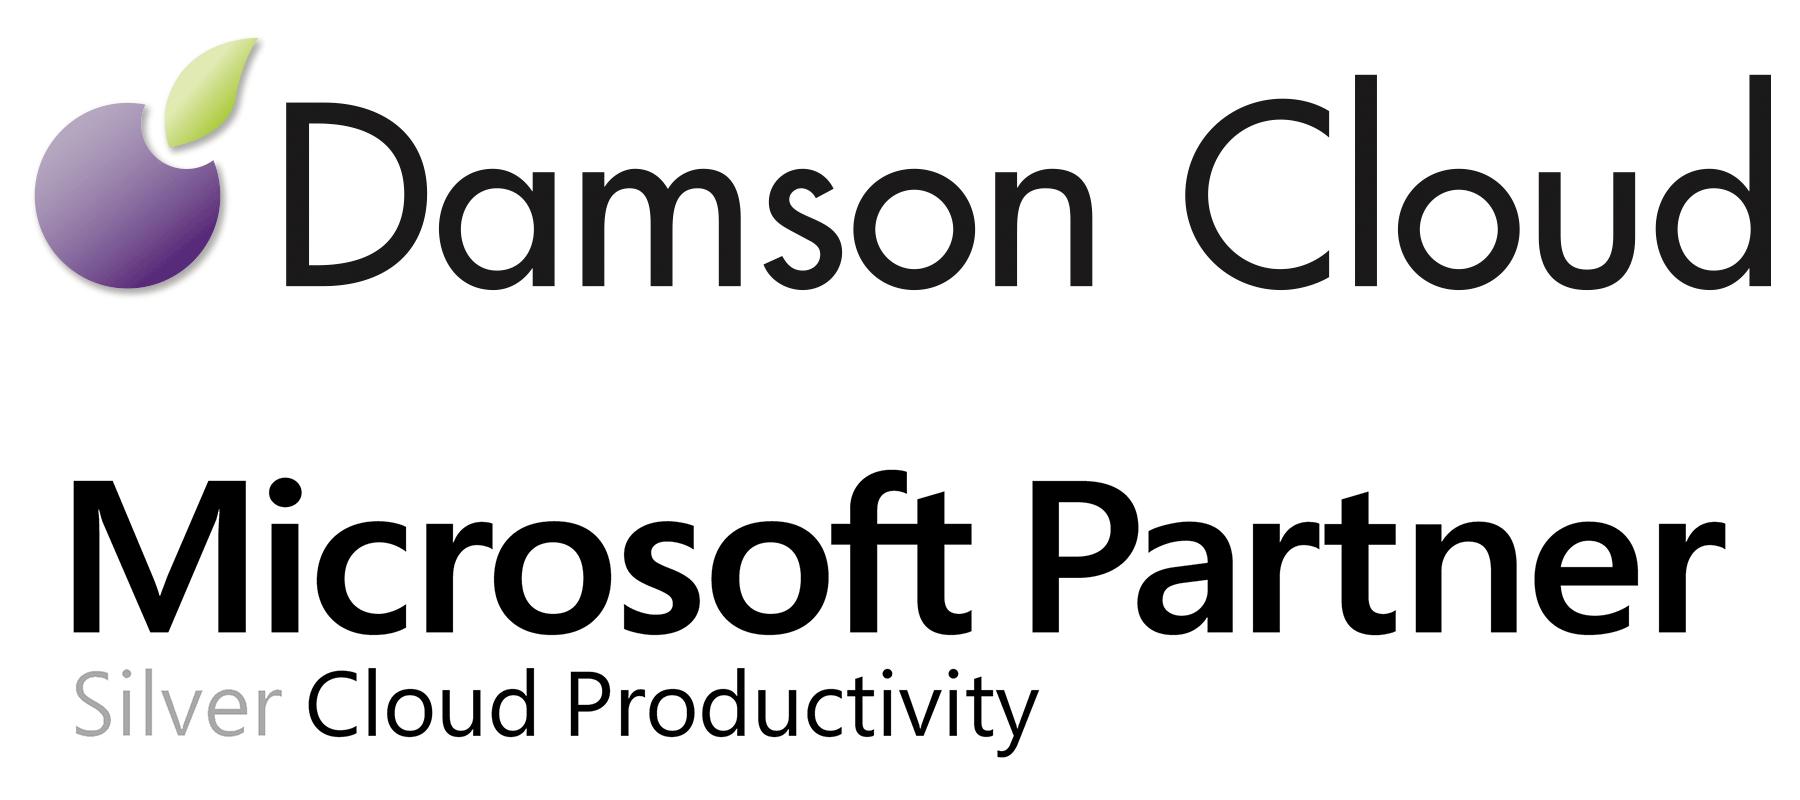 Damson Cloud Achieves Microsoft Silver Cloud Productivity